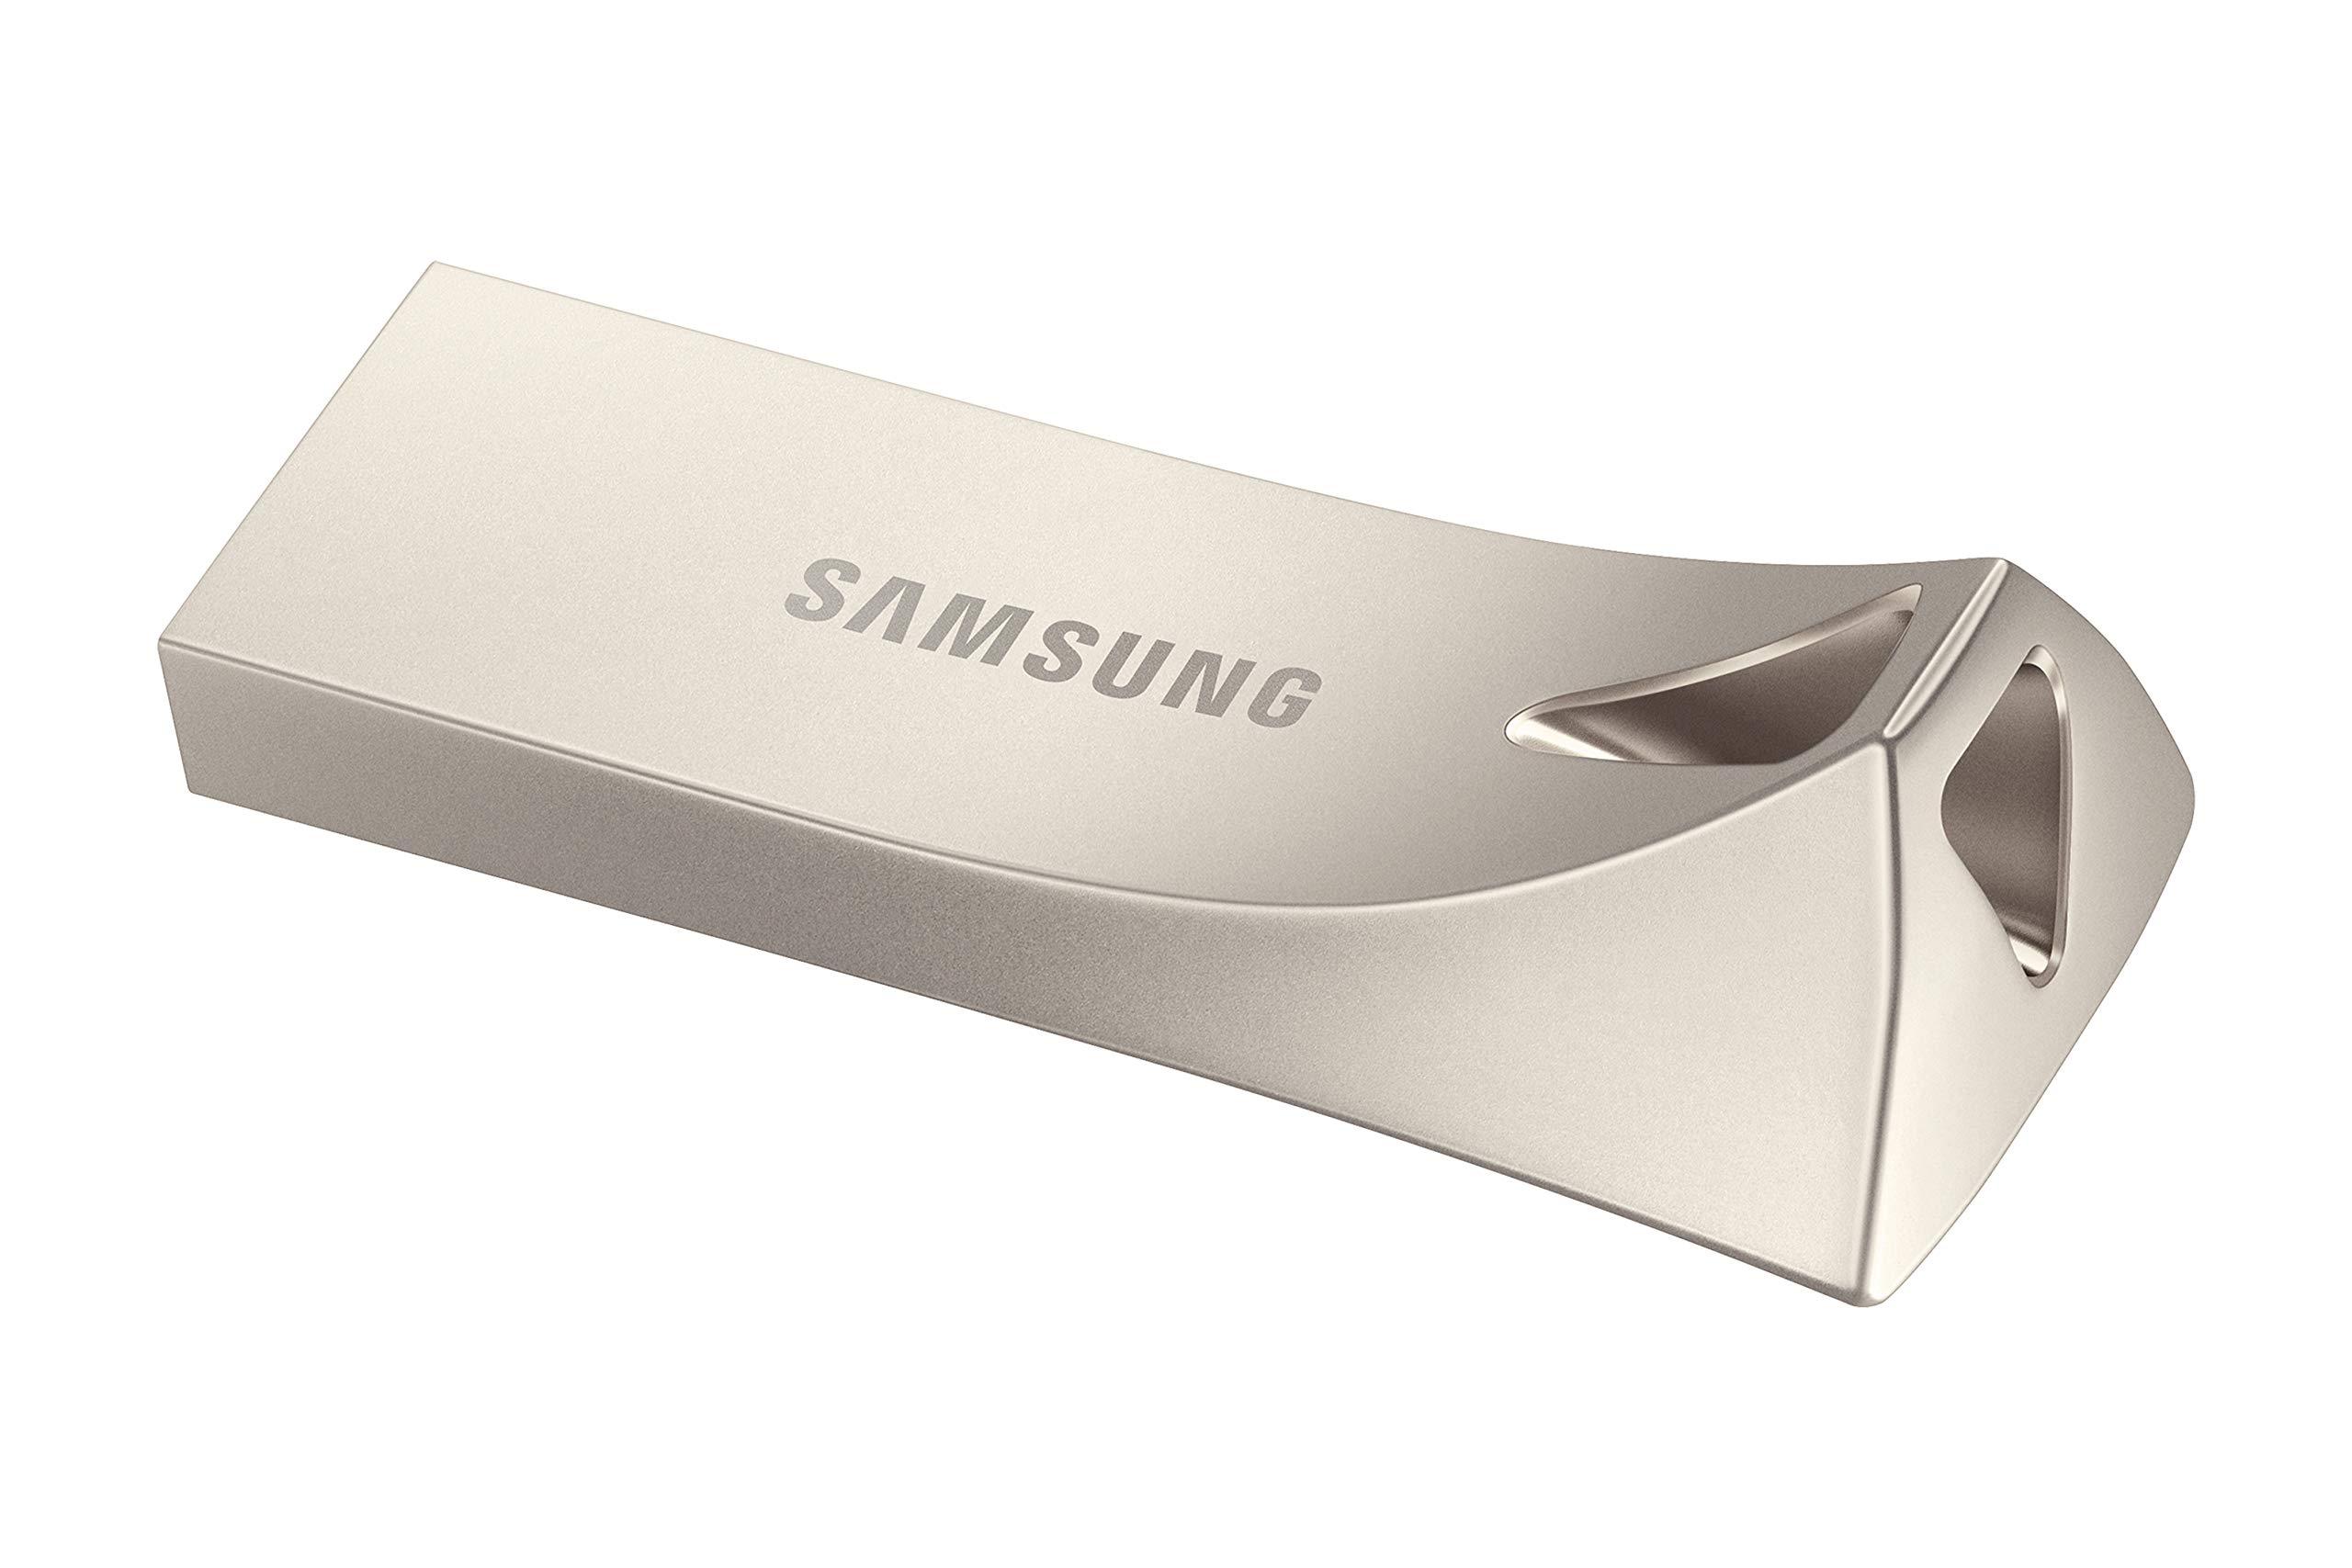 Samsung BAR Plus 256GB - 300MB/s USB 3.1 Flash Drive Champagne Silver (MUF-256BE3/AM) by Samsung